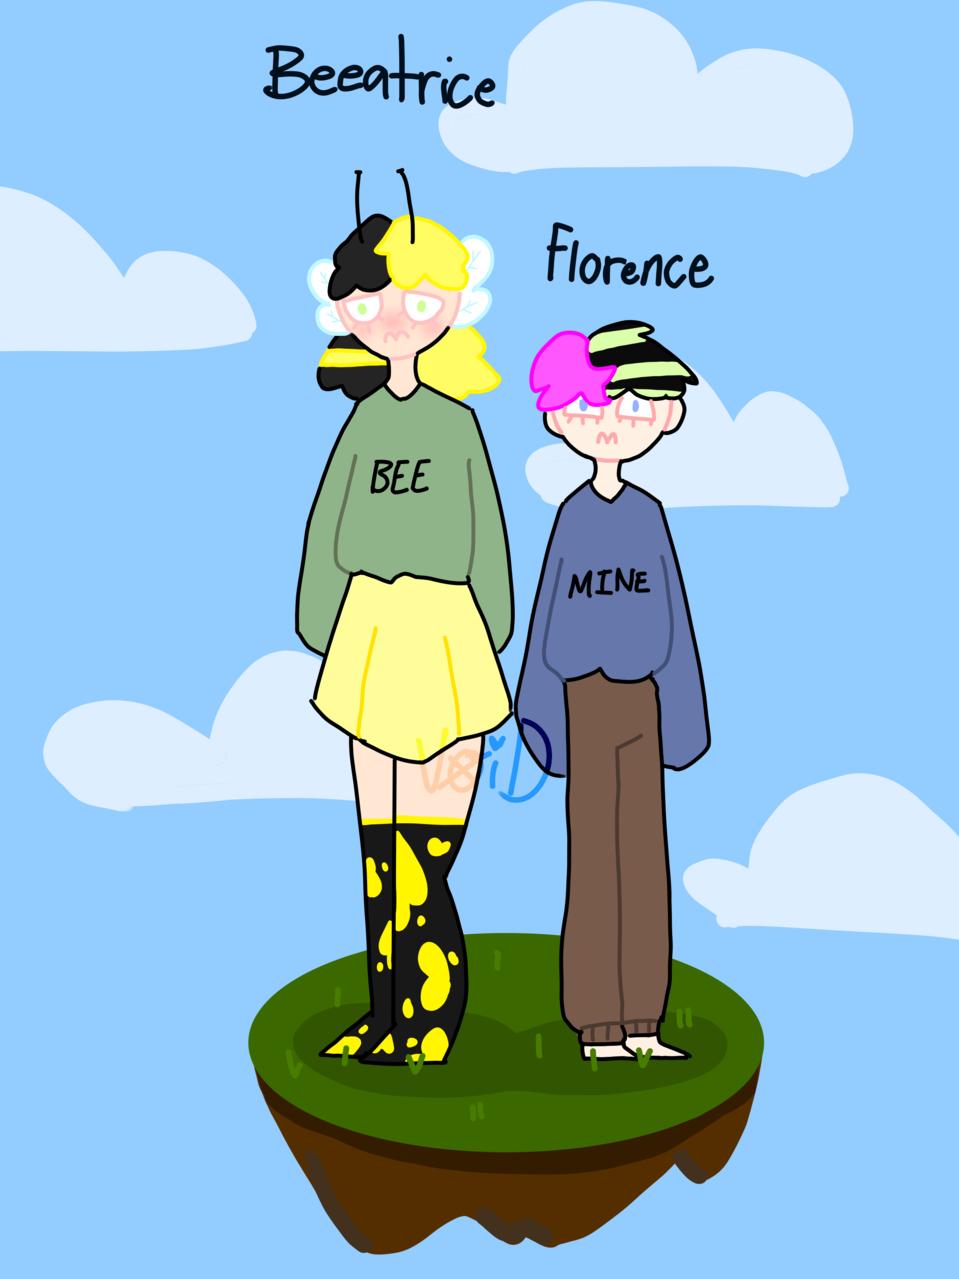 bee x flower [read desc if u want] Illust of 𝖍𝖊𝖑𝖑𝖔 𝖐𝖎𝖙𝖙𝖞